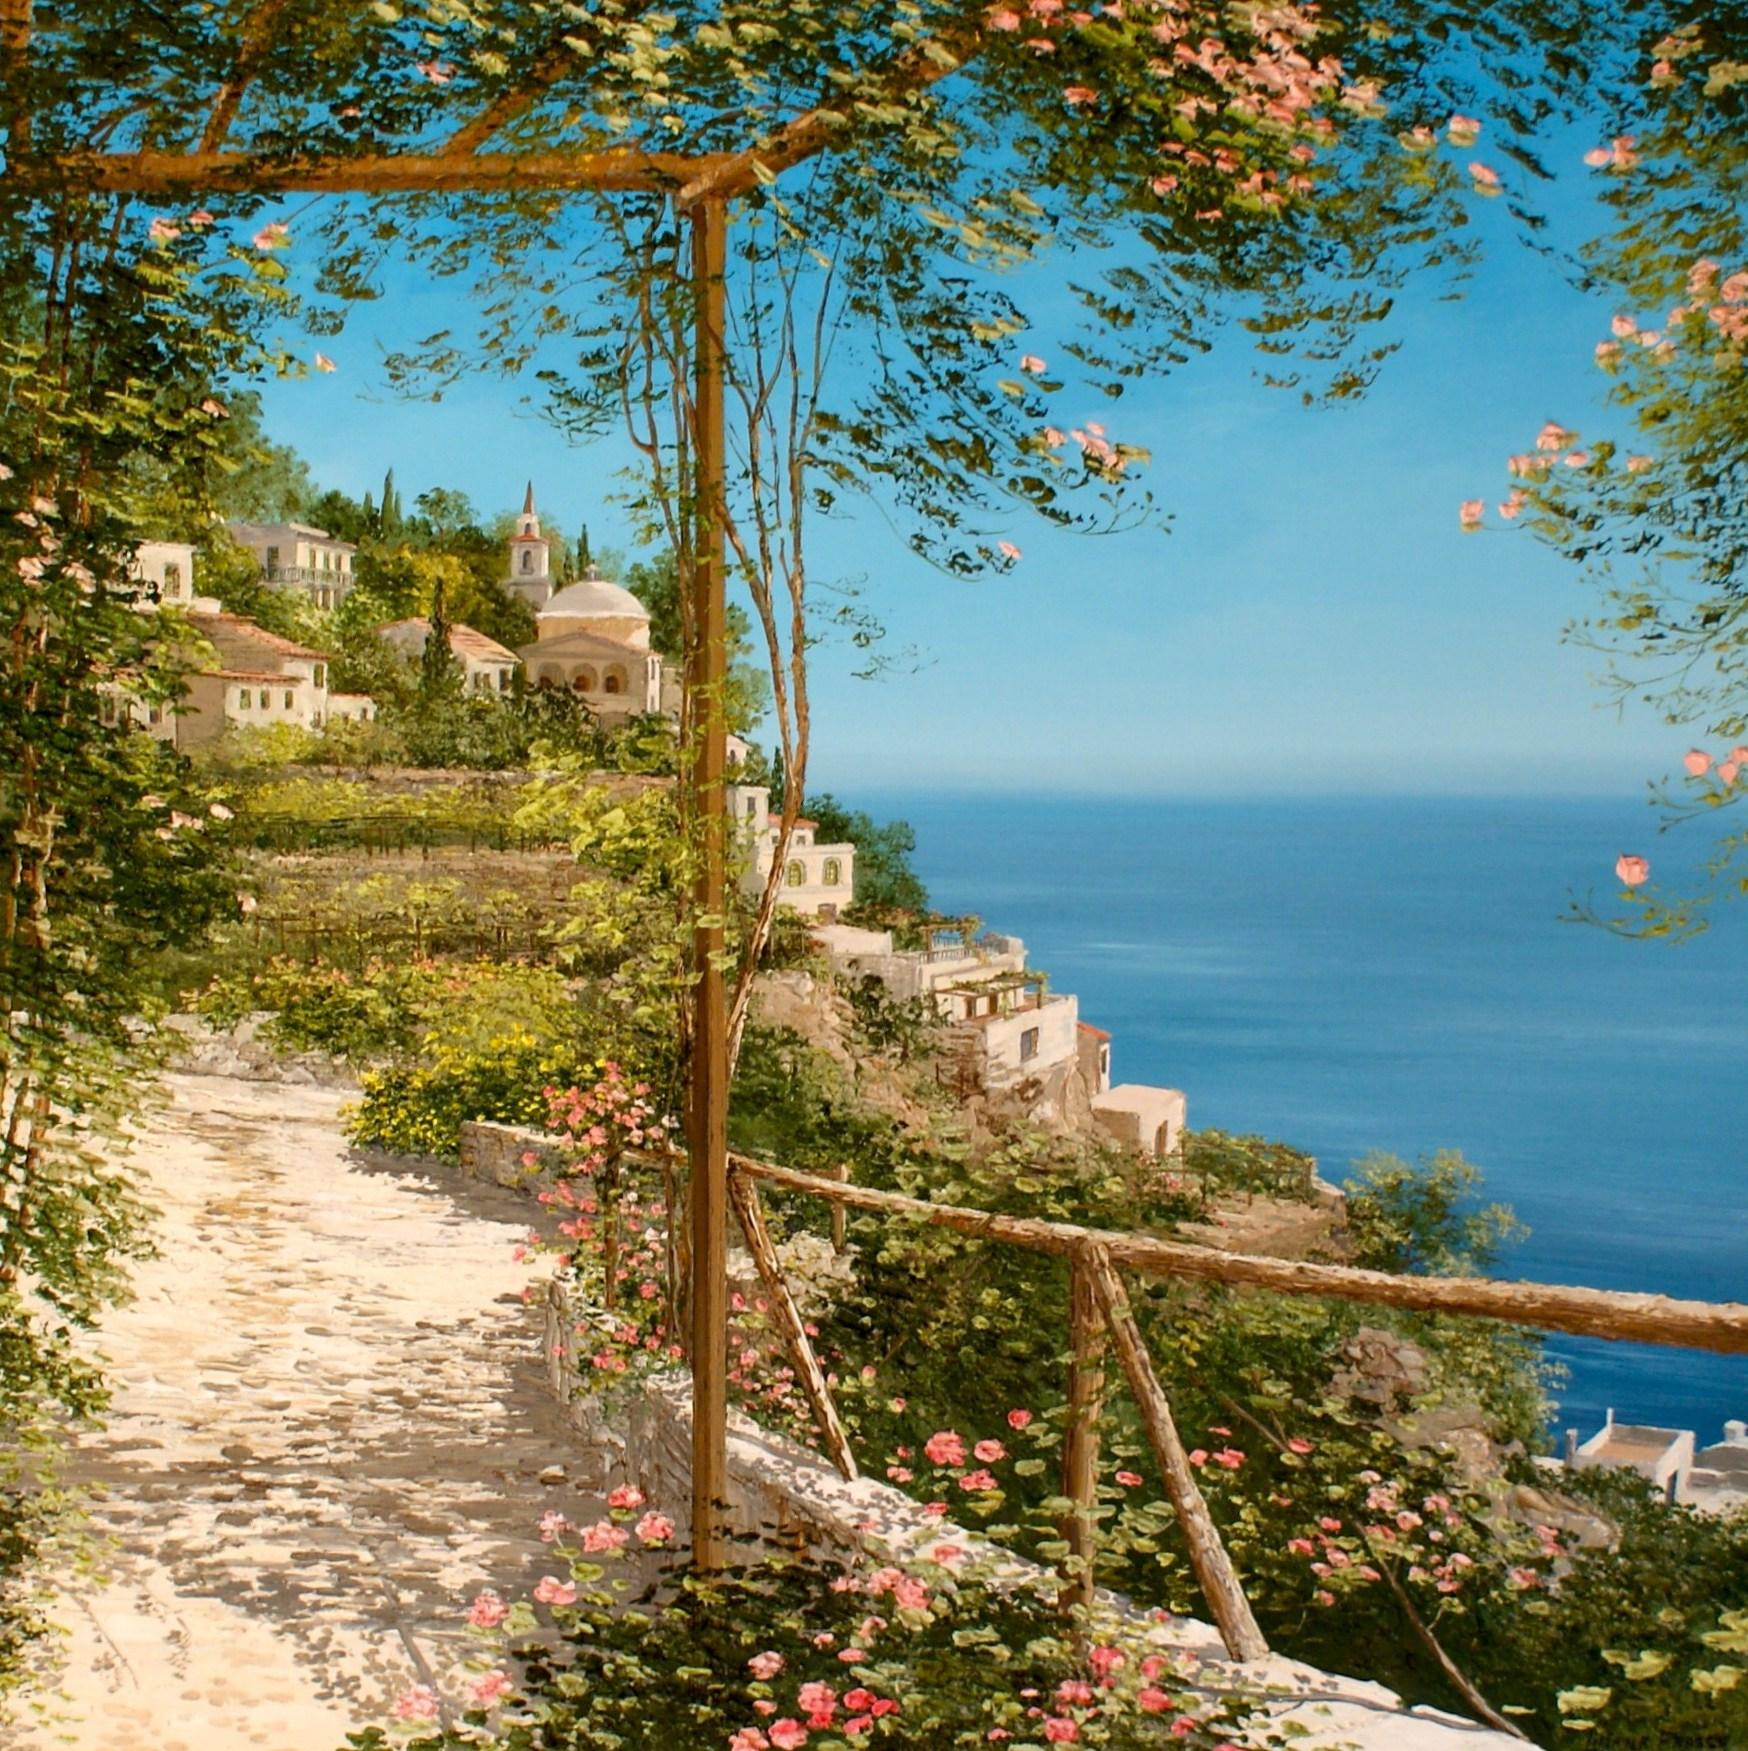 Artist: Liliana Frasca Title: Amalfi Coast Size: 40in x 40in Framed: Yes Medium: Oil on Canvas